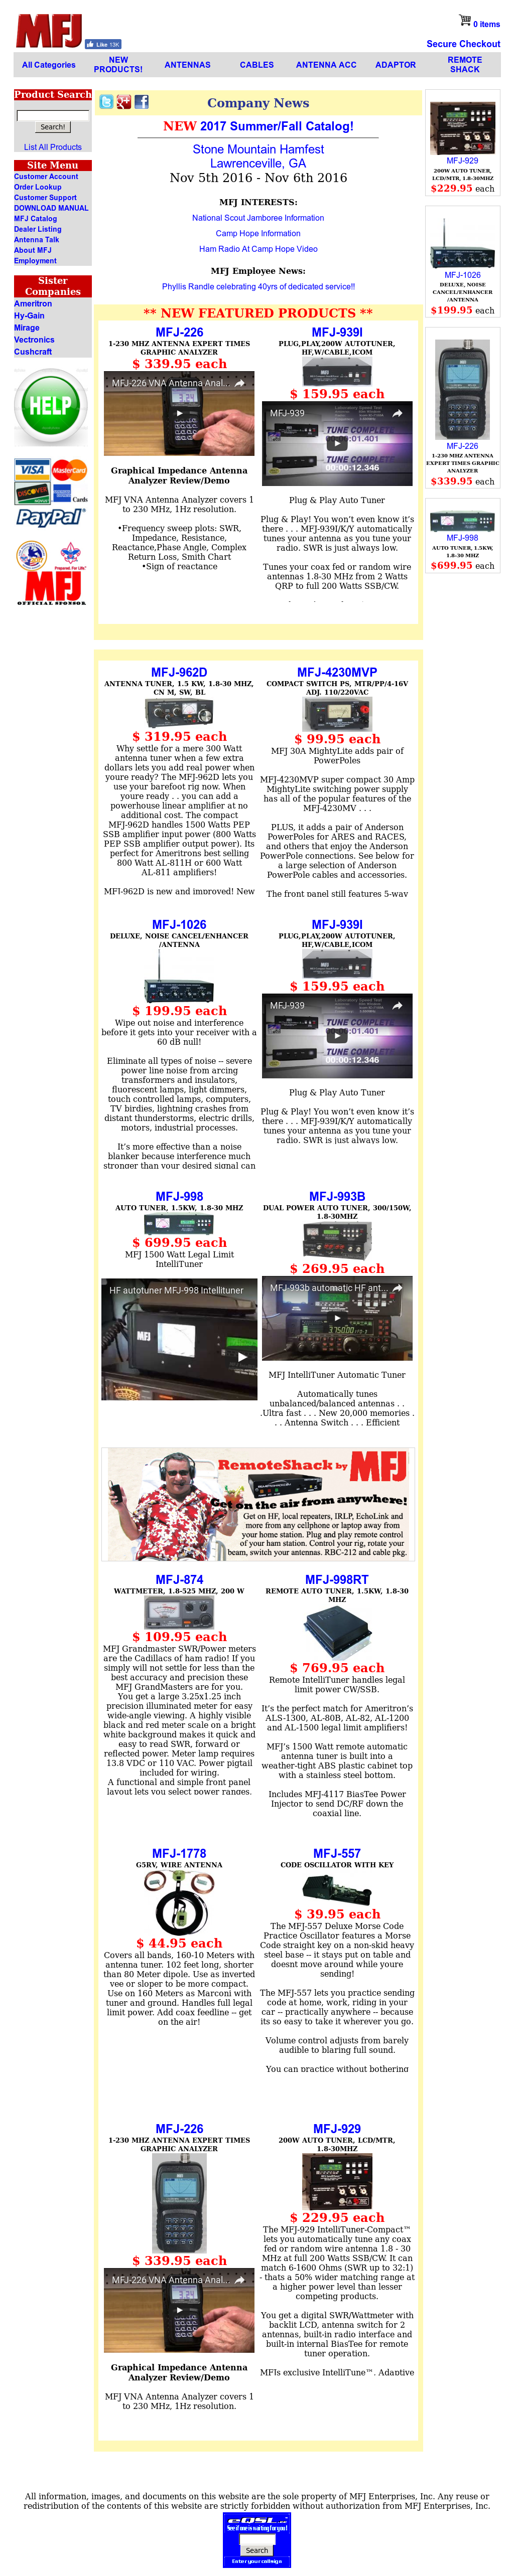 MFJ Competitors, Revenue and Employees - Owler Company Profile